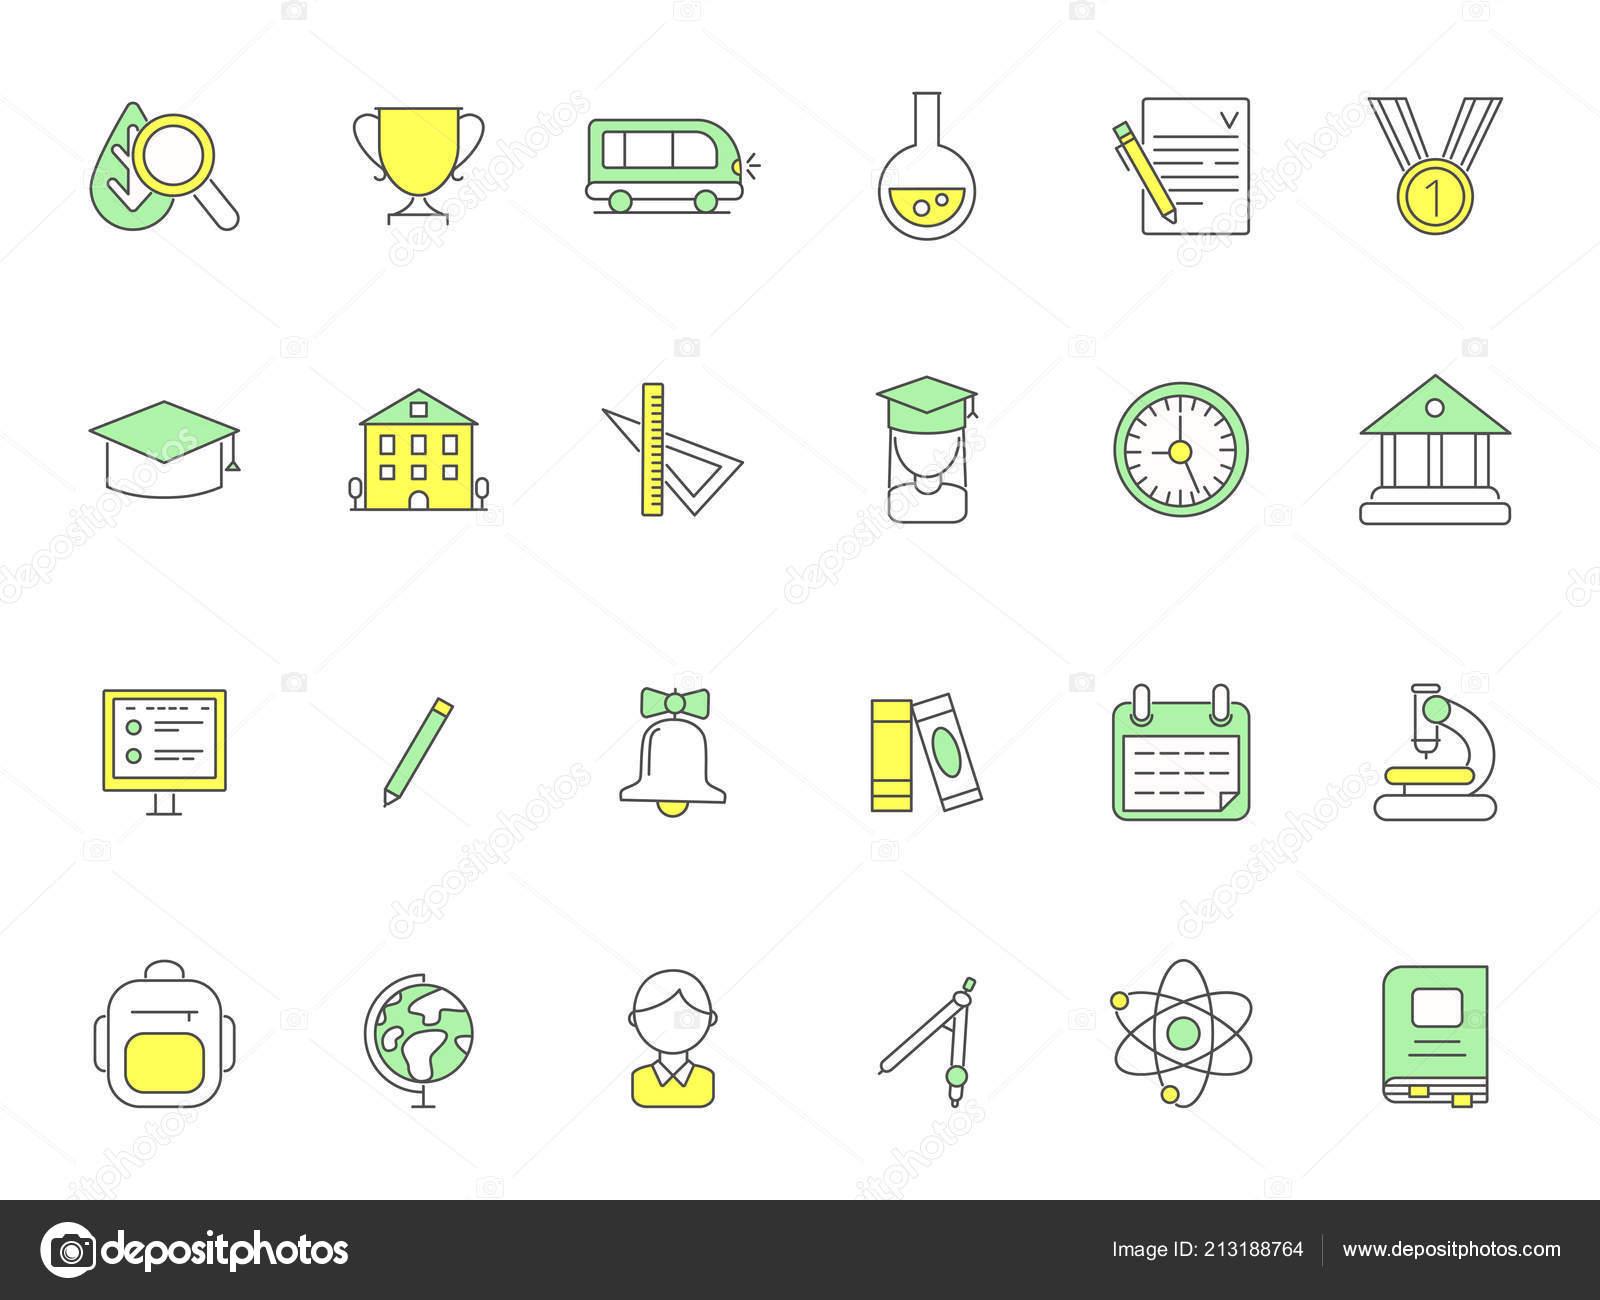 Colored School Icons Vector Symbols Of Science